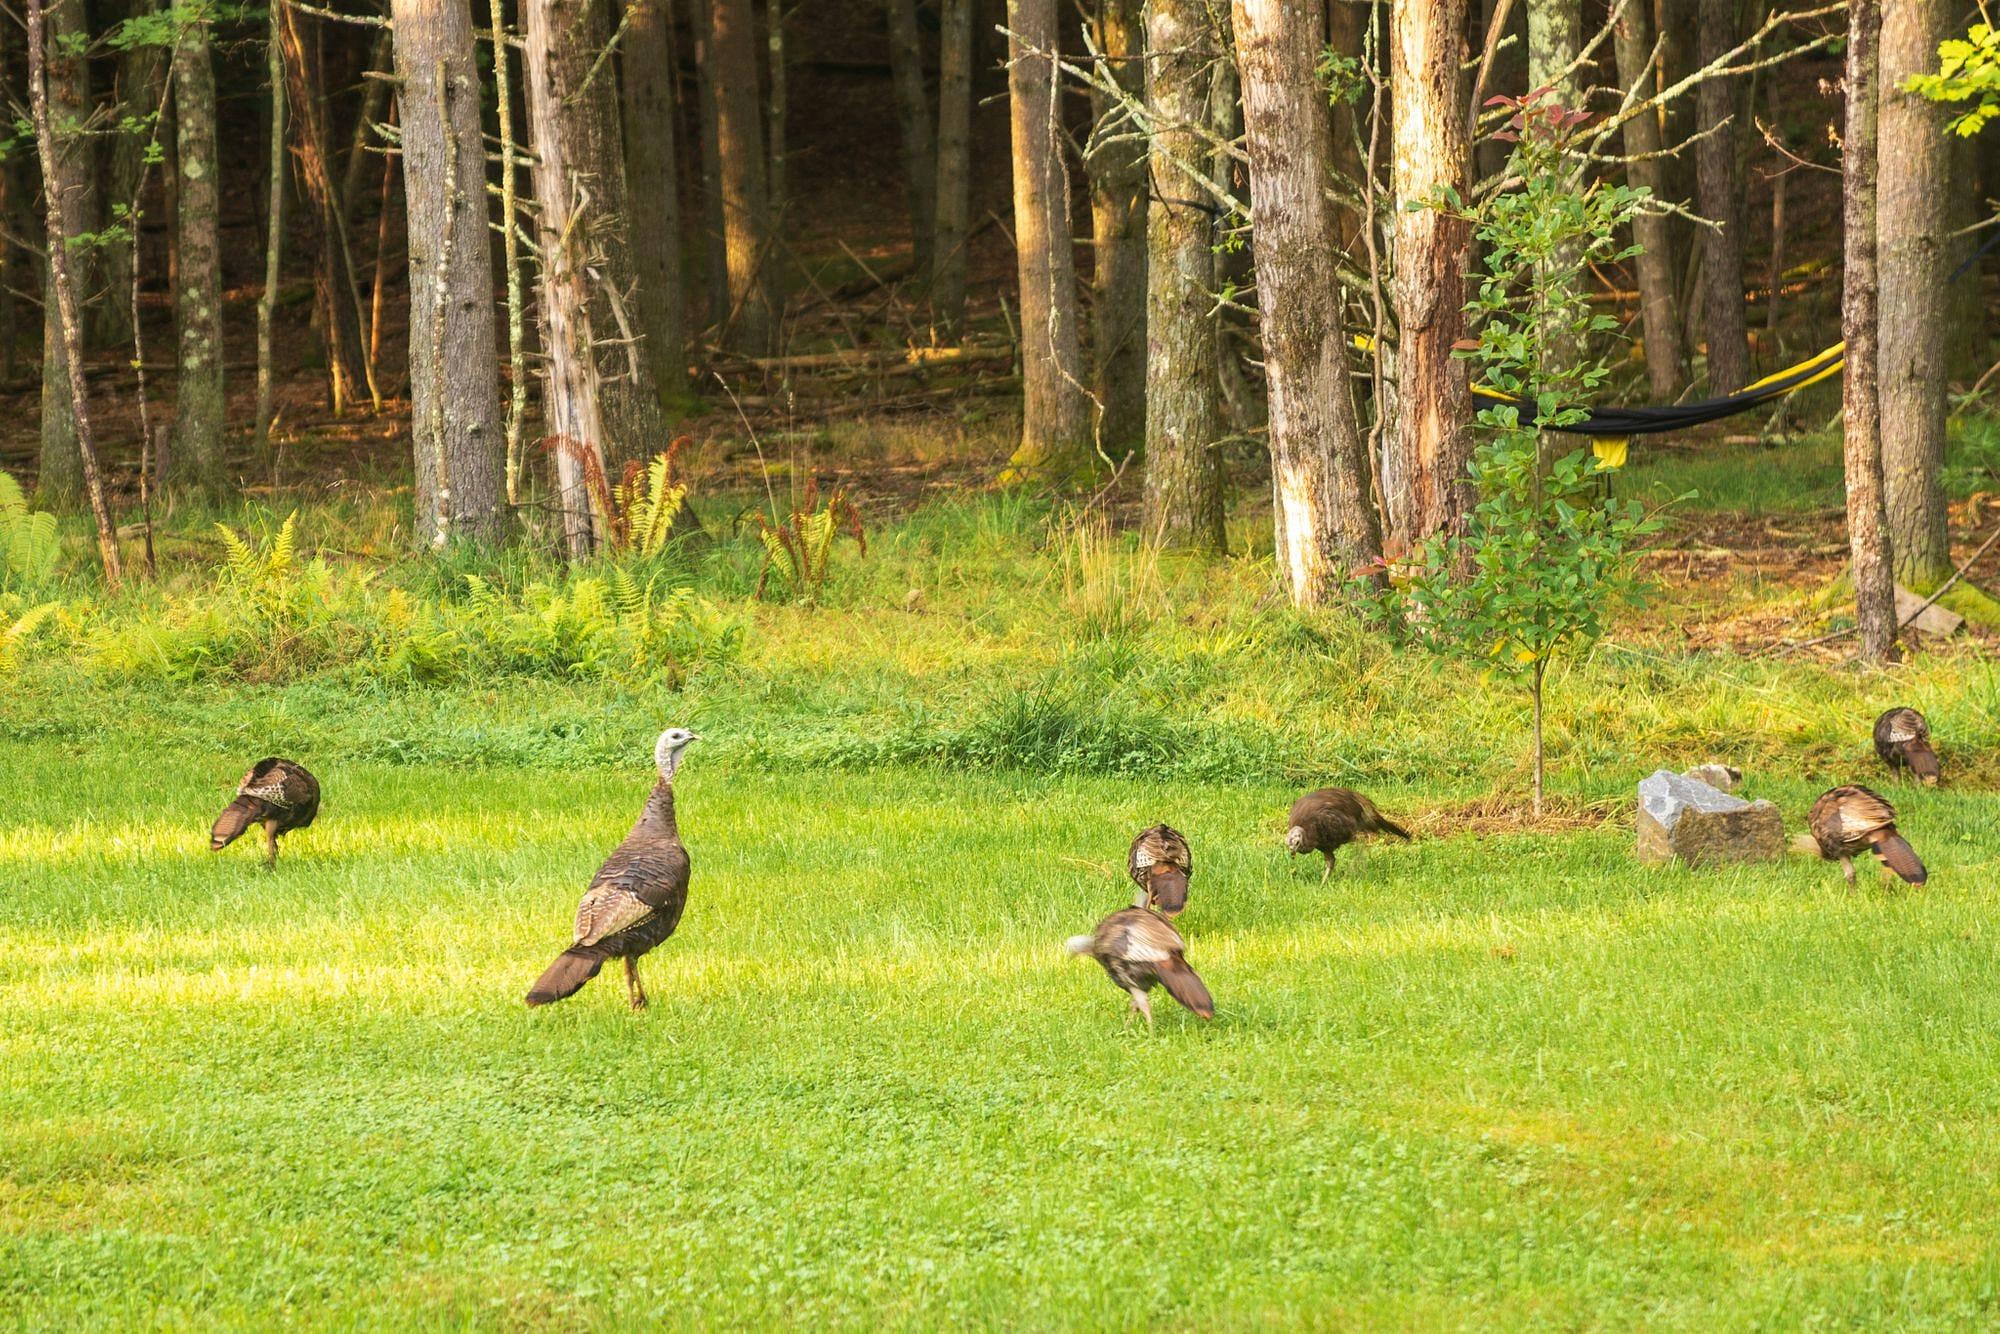 New York Wild Turkeys